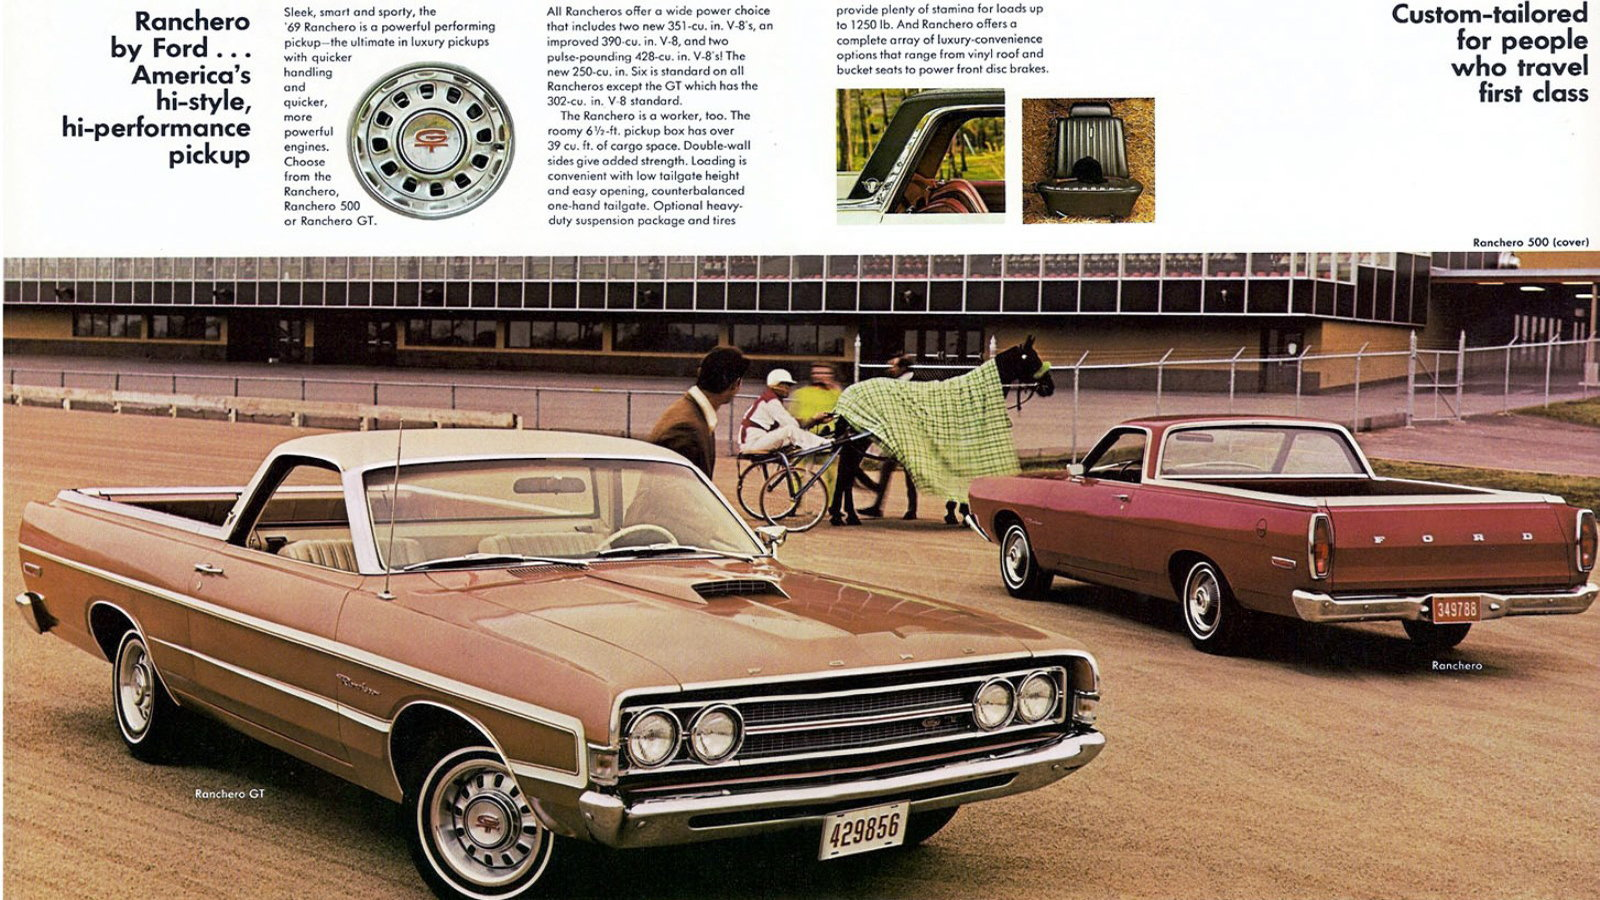 1968-71 Ranchero GT